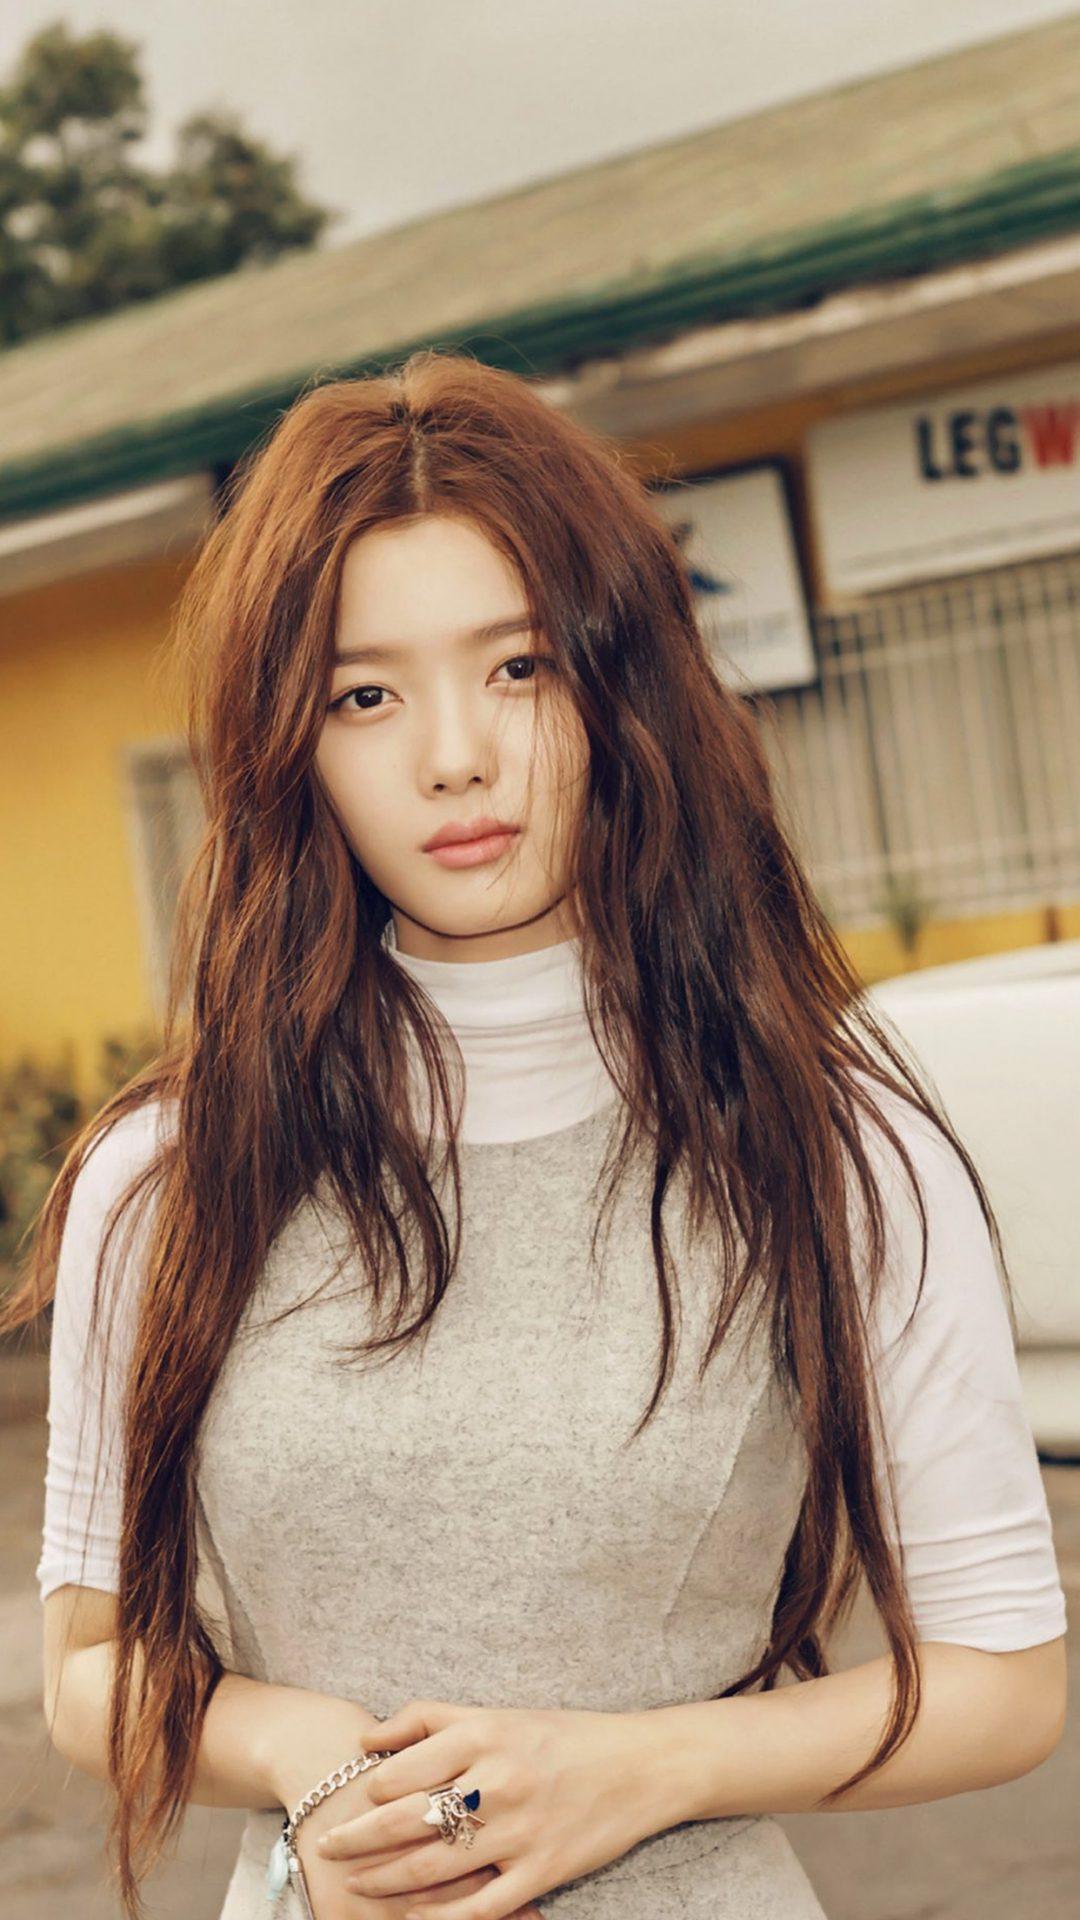 Kim Yoo Jung Kpop Girl Cute